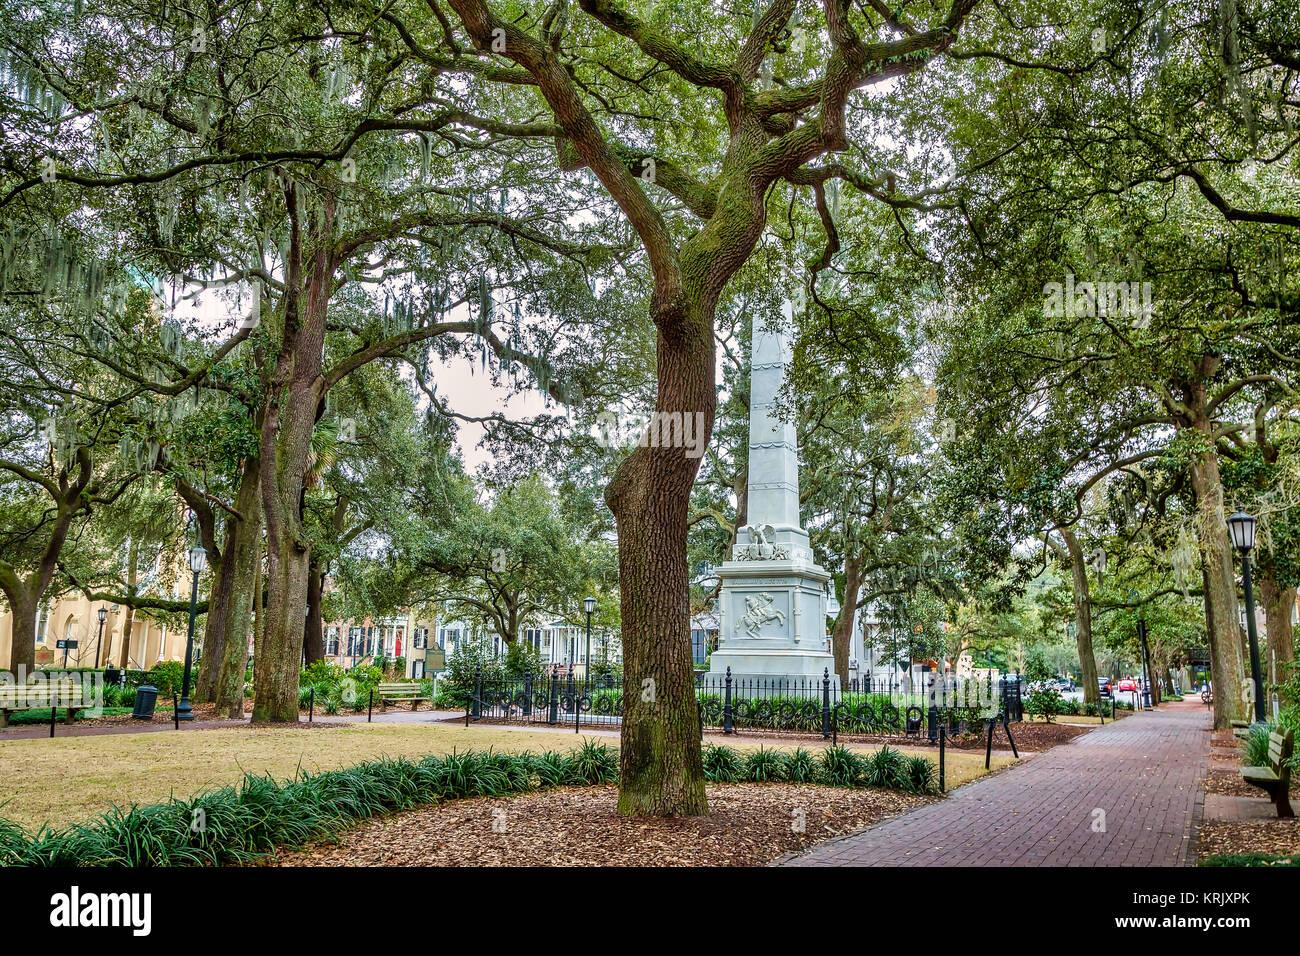 Monterey Square in Savannah, Georgia - Stock Image